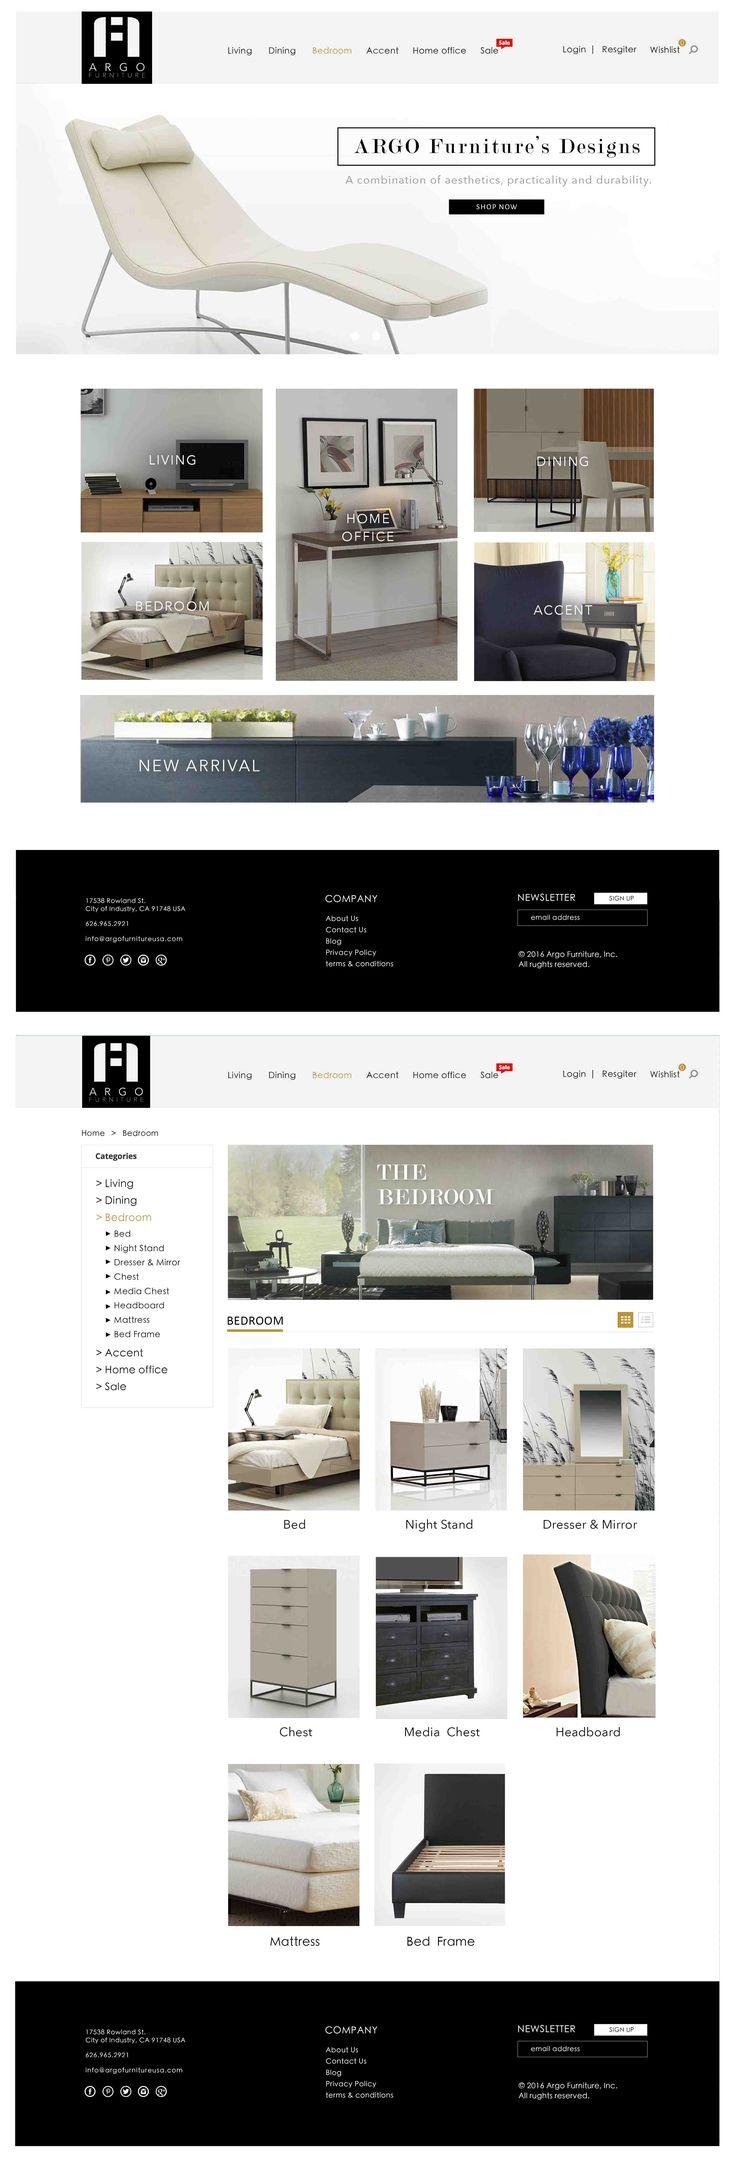 #OODDA #website #design #profolio #marketing #host #maintenance #Magento #wordpress #online #business #promote  #Argo #Furniture